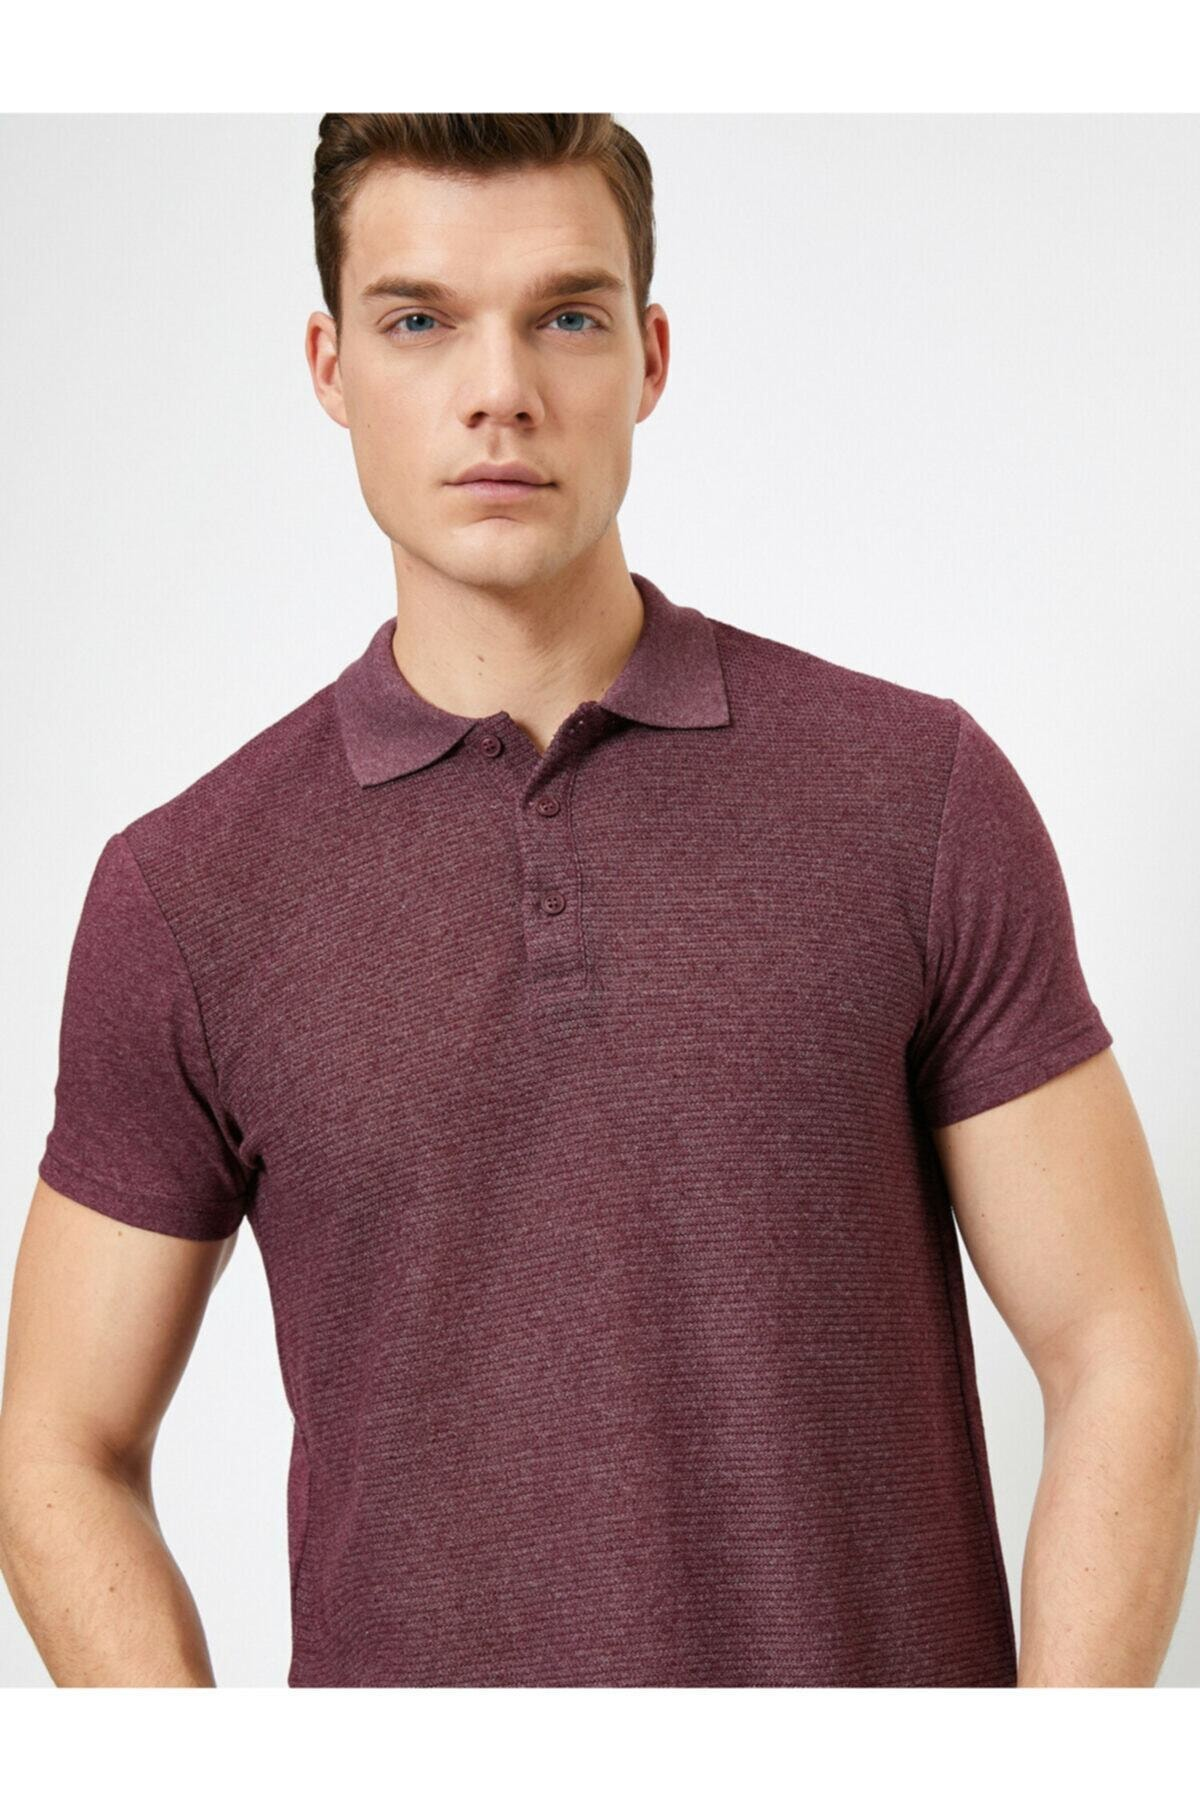 خرید پولوشرت 2021 مردانه برند کوتون رنگ زرشکی ty36903847